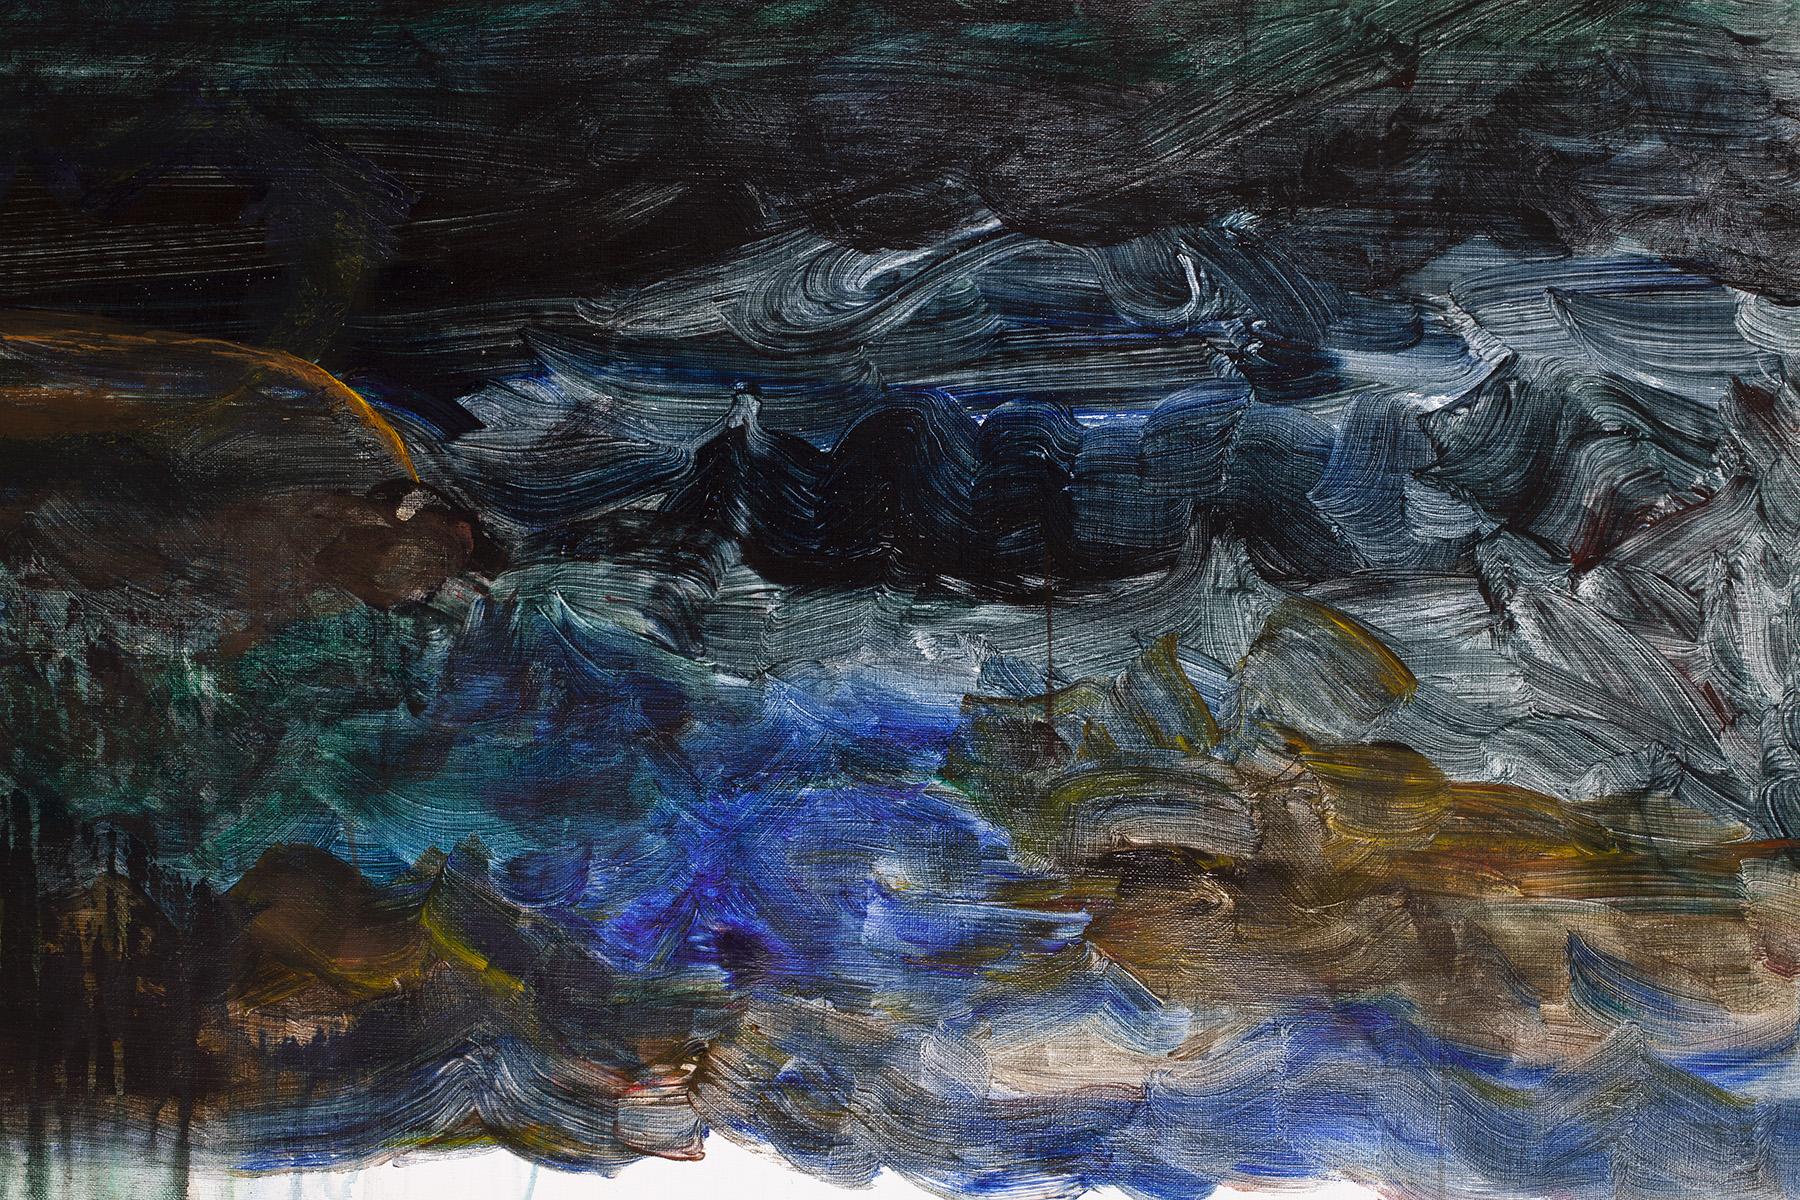 12.) Ono, Boat Sinking. 2018.  Acrylic on canvas, 38.25 in x 53 in (97.2 cm x 134.6 cm) copy.jpg